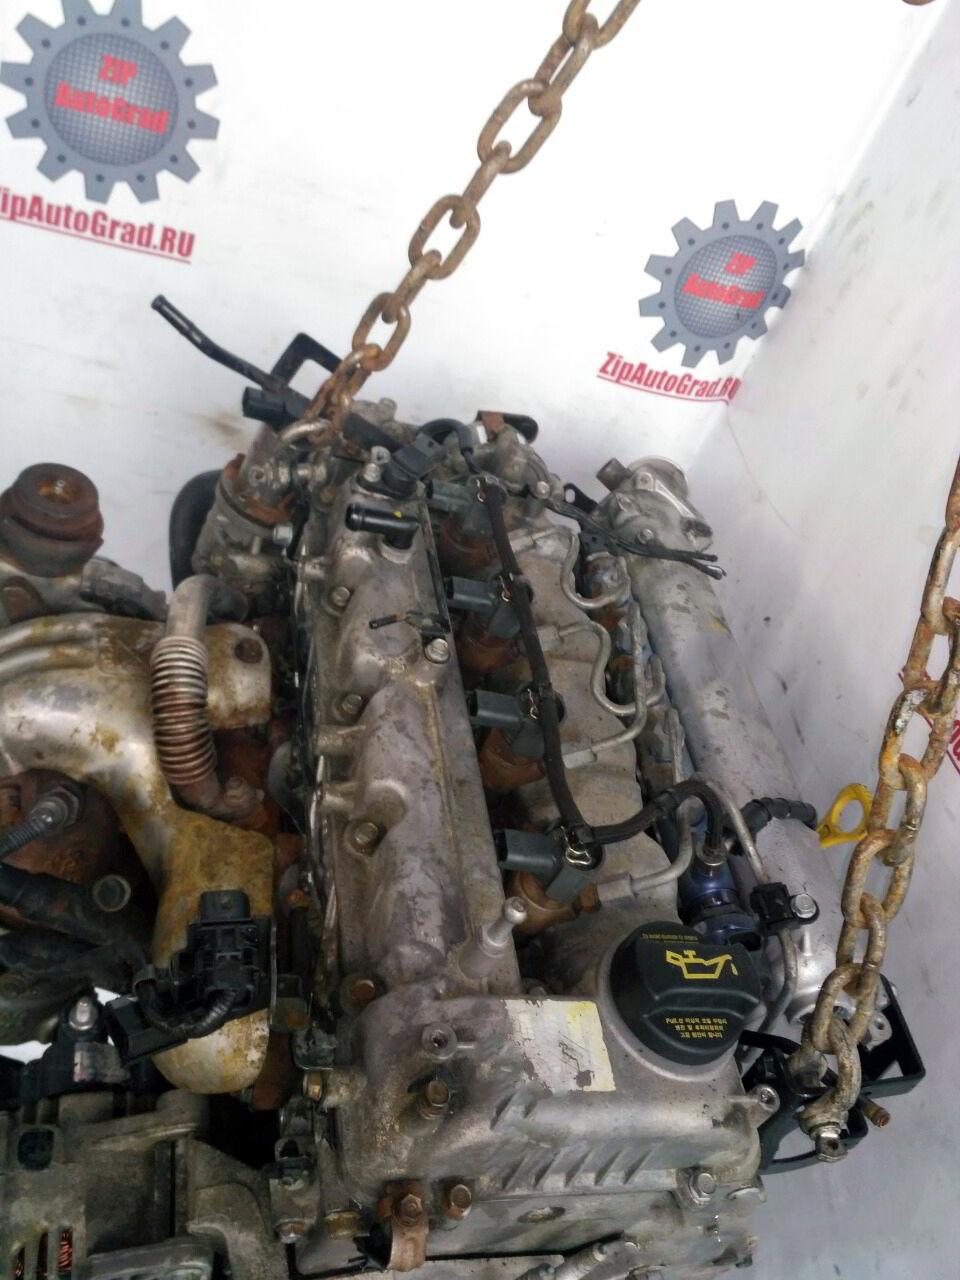 Двигатель Kia Rio. Кузов: 3. D4FB. , 1.6л., 115л.с.  фото 2